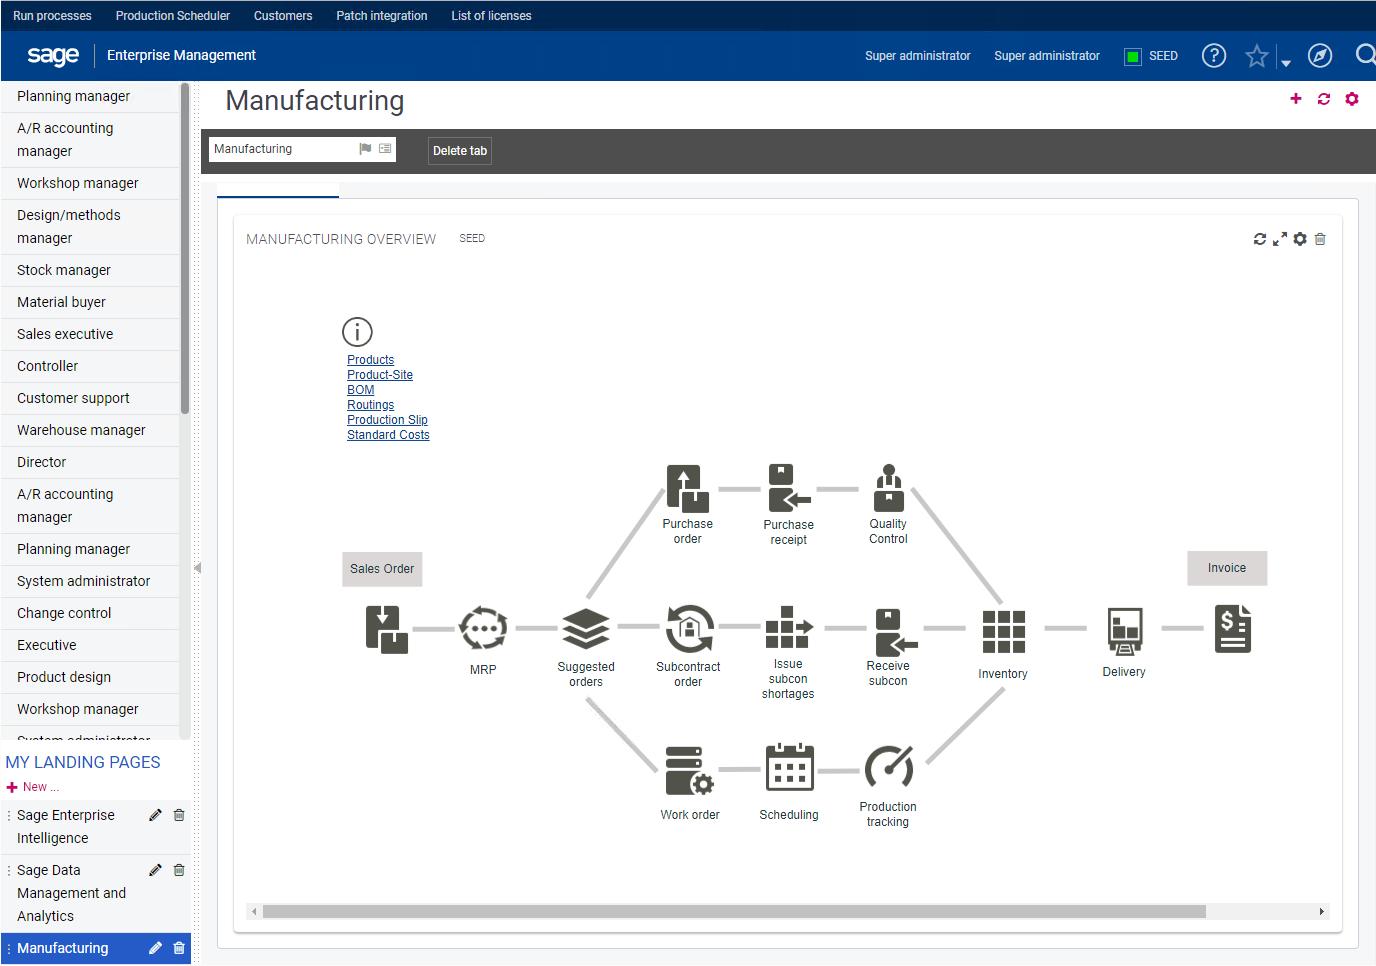 Sage Business Cloud Enterprise Management Demo - Manufacturing Interface